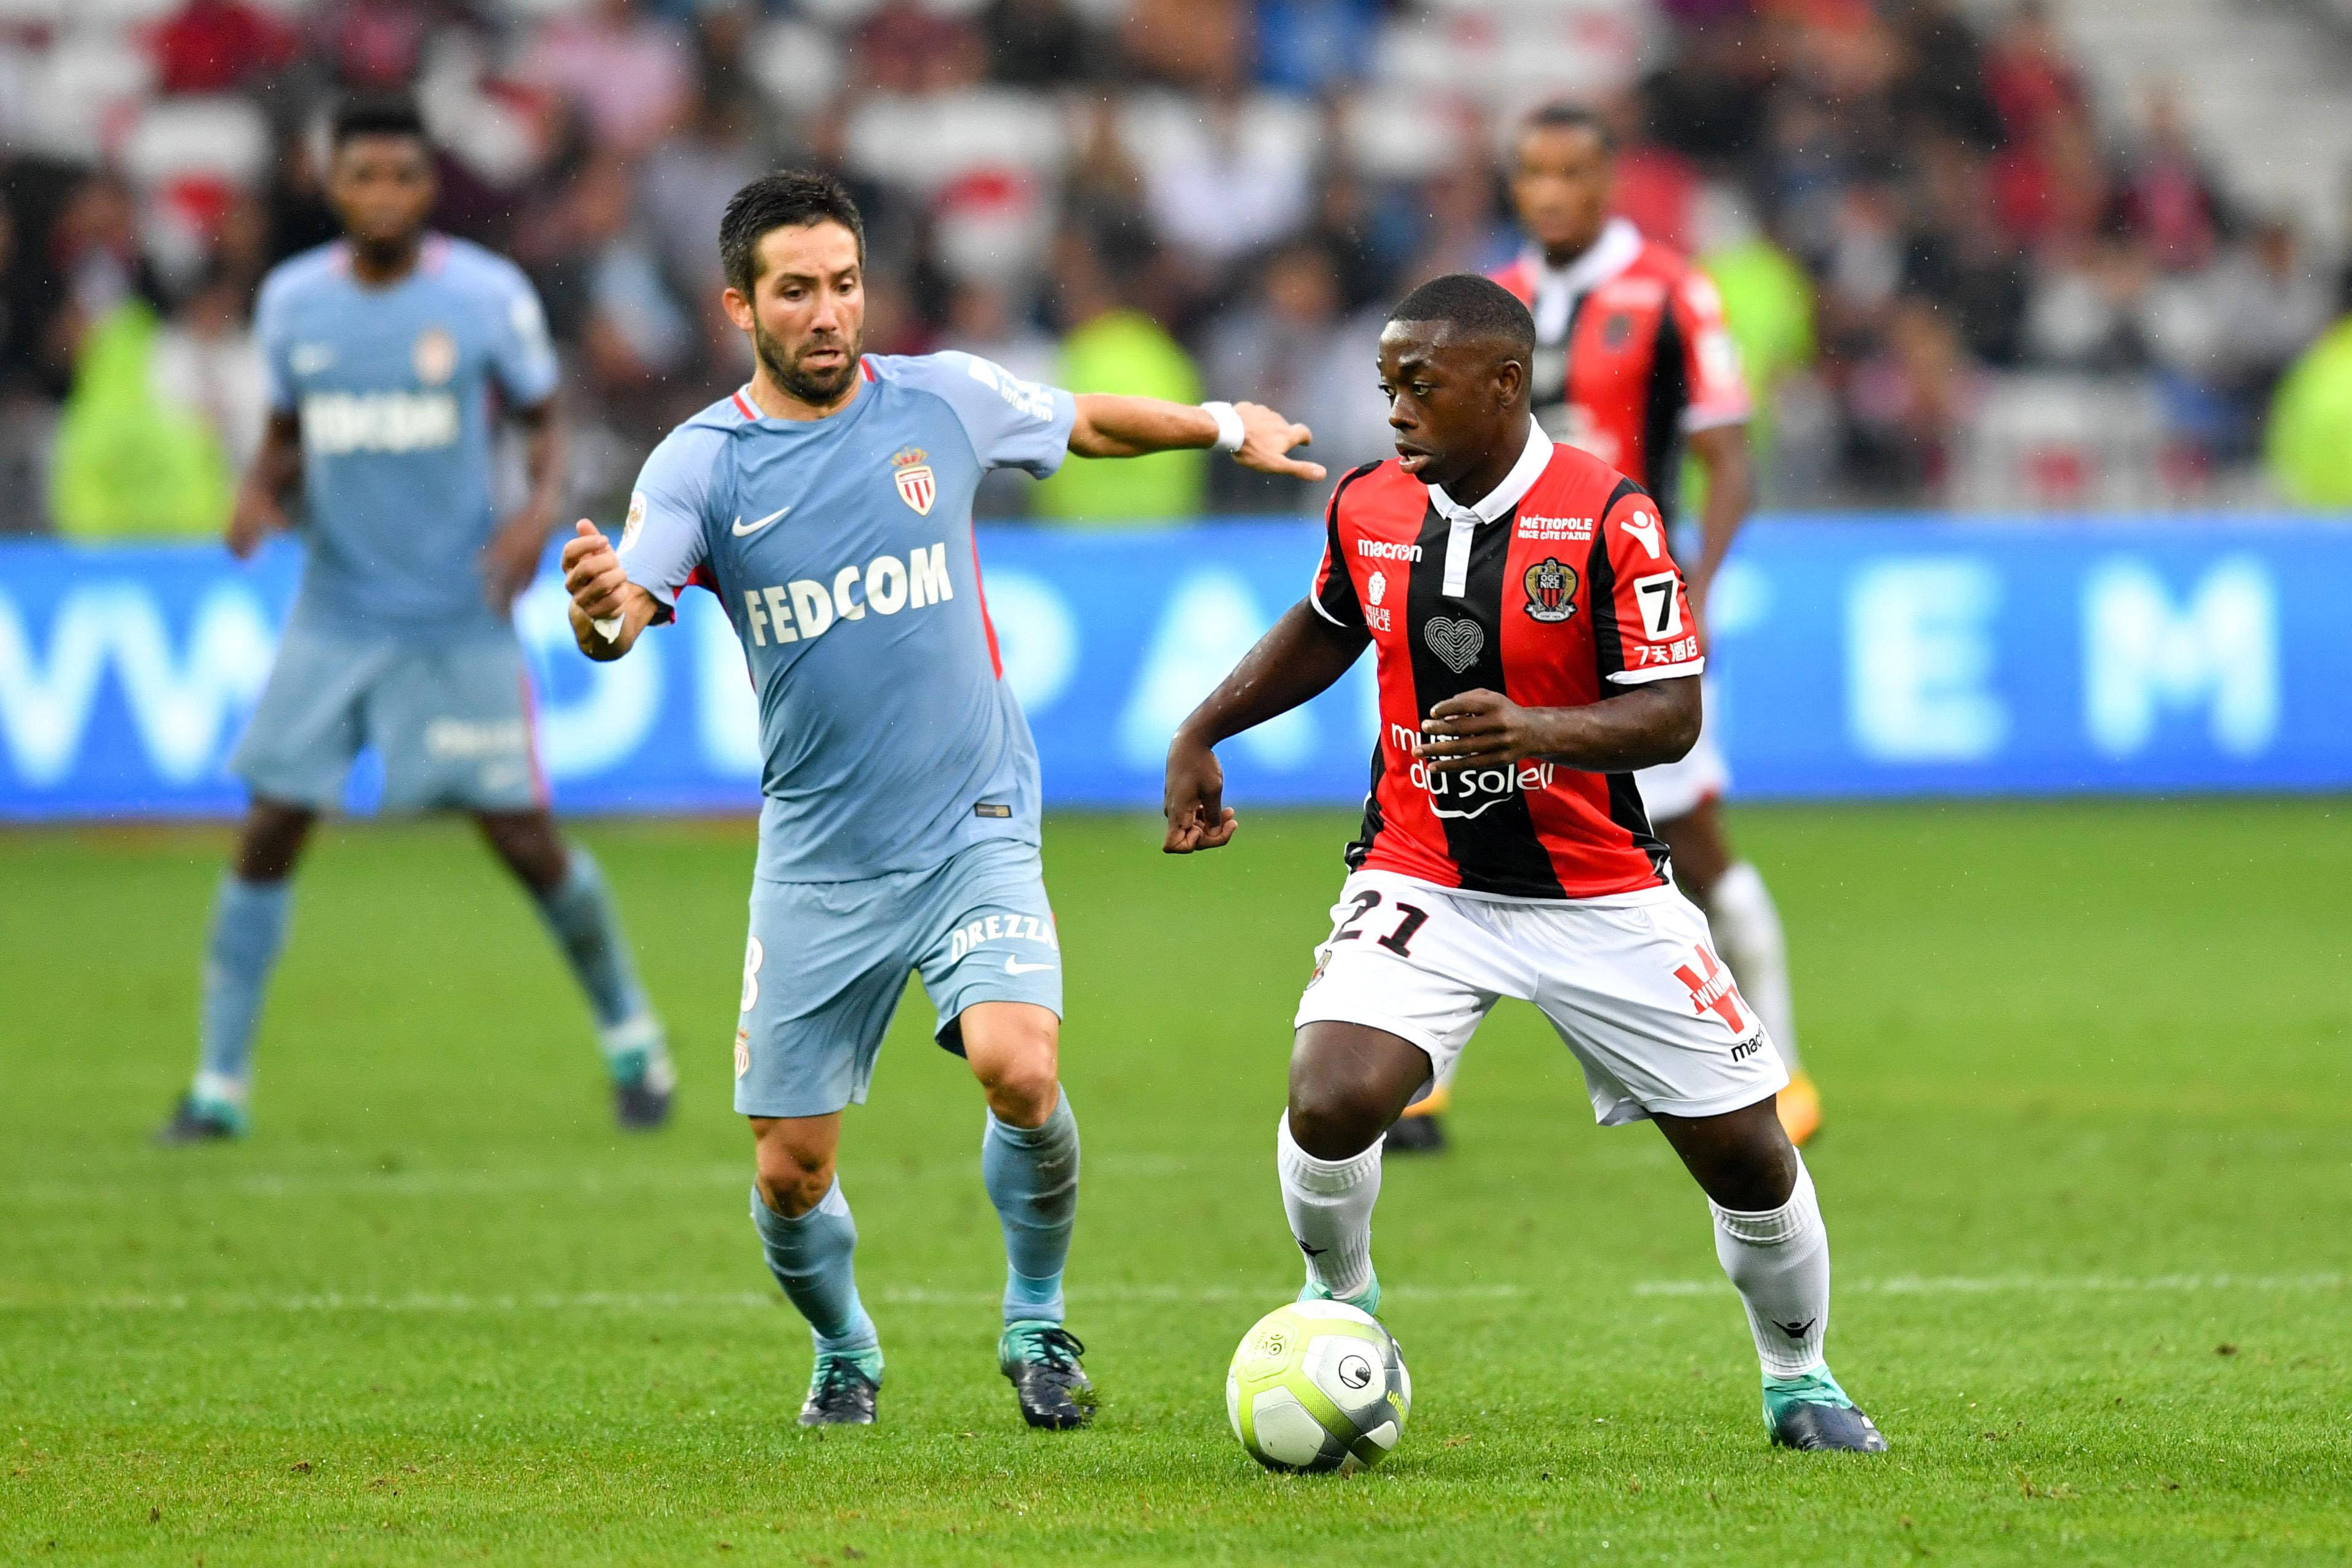 Amiens psg et nice monaco en quarts de finale de la coupe de la ligue coupe de la ligue football - Football coupe de la ligue direct ...